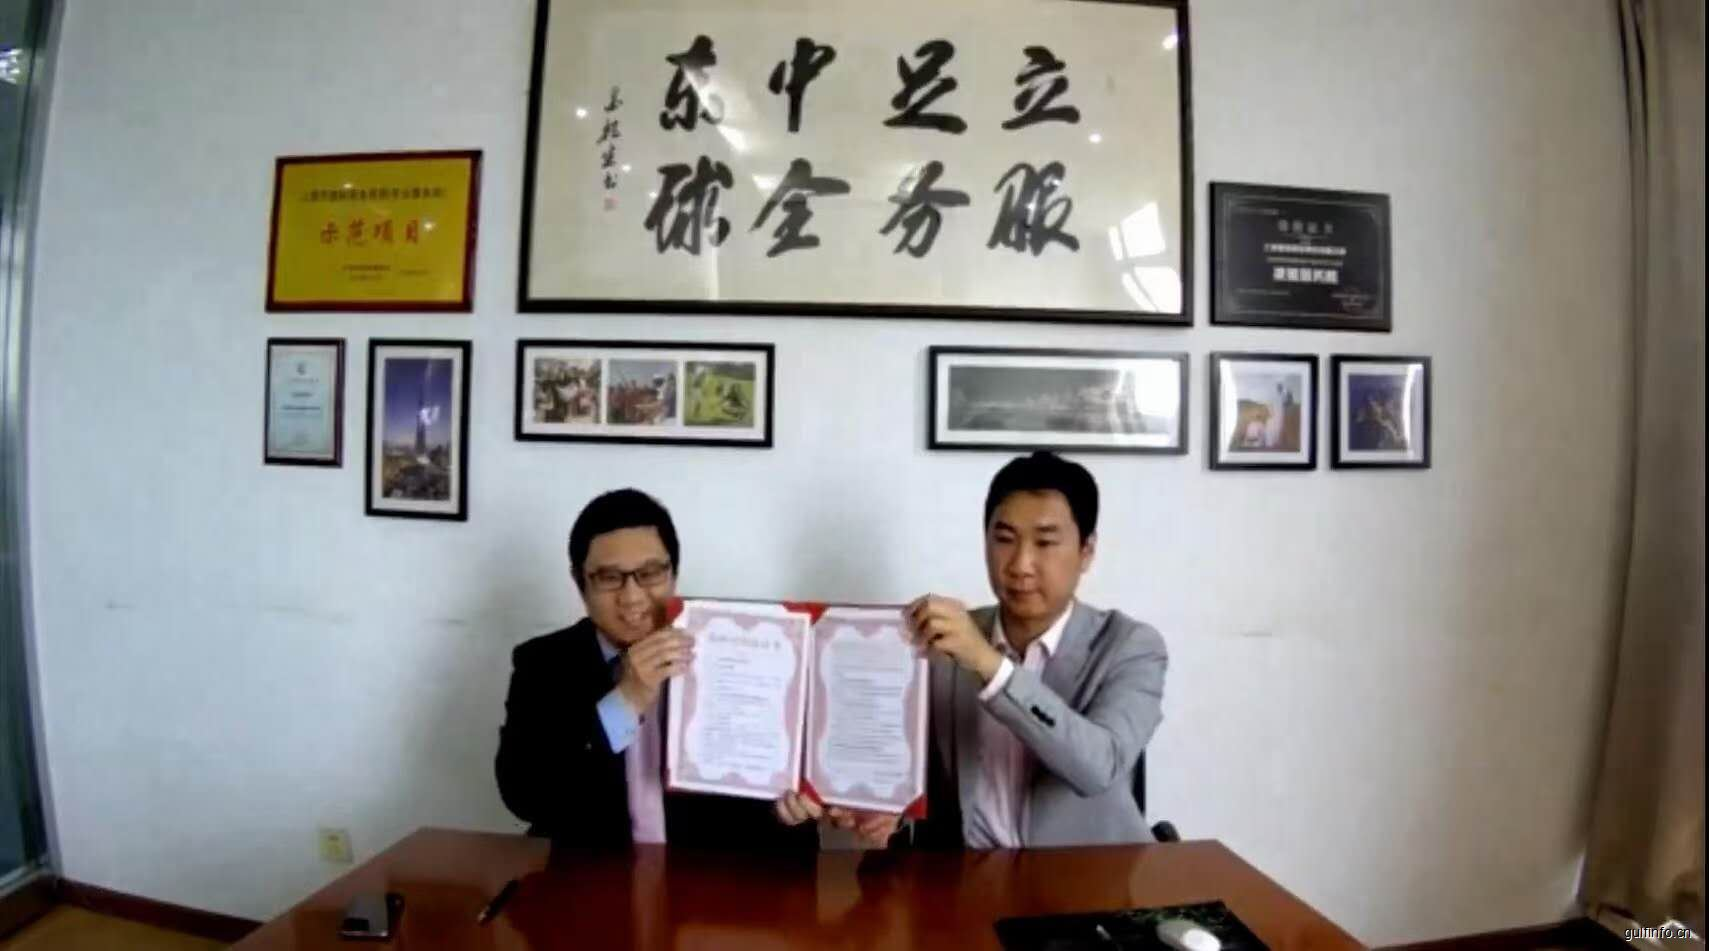 MIE集团—广东省对外经济贸易企业协会达成战略合作